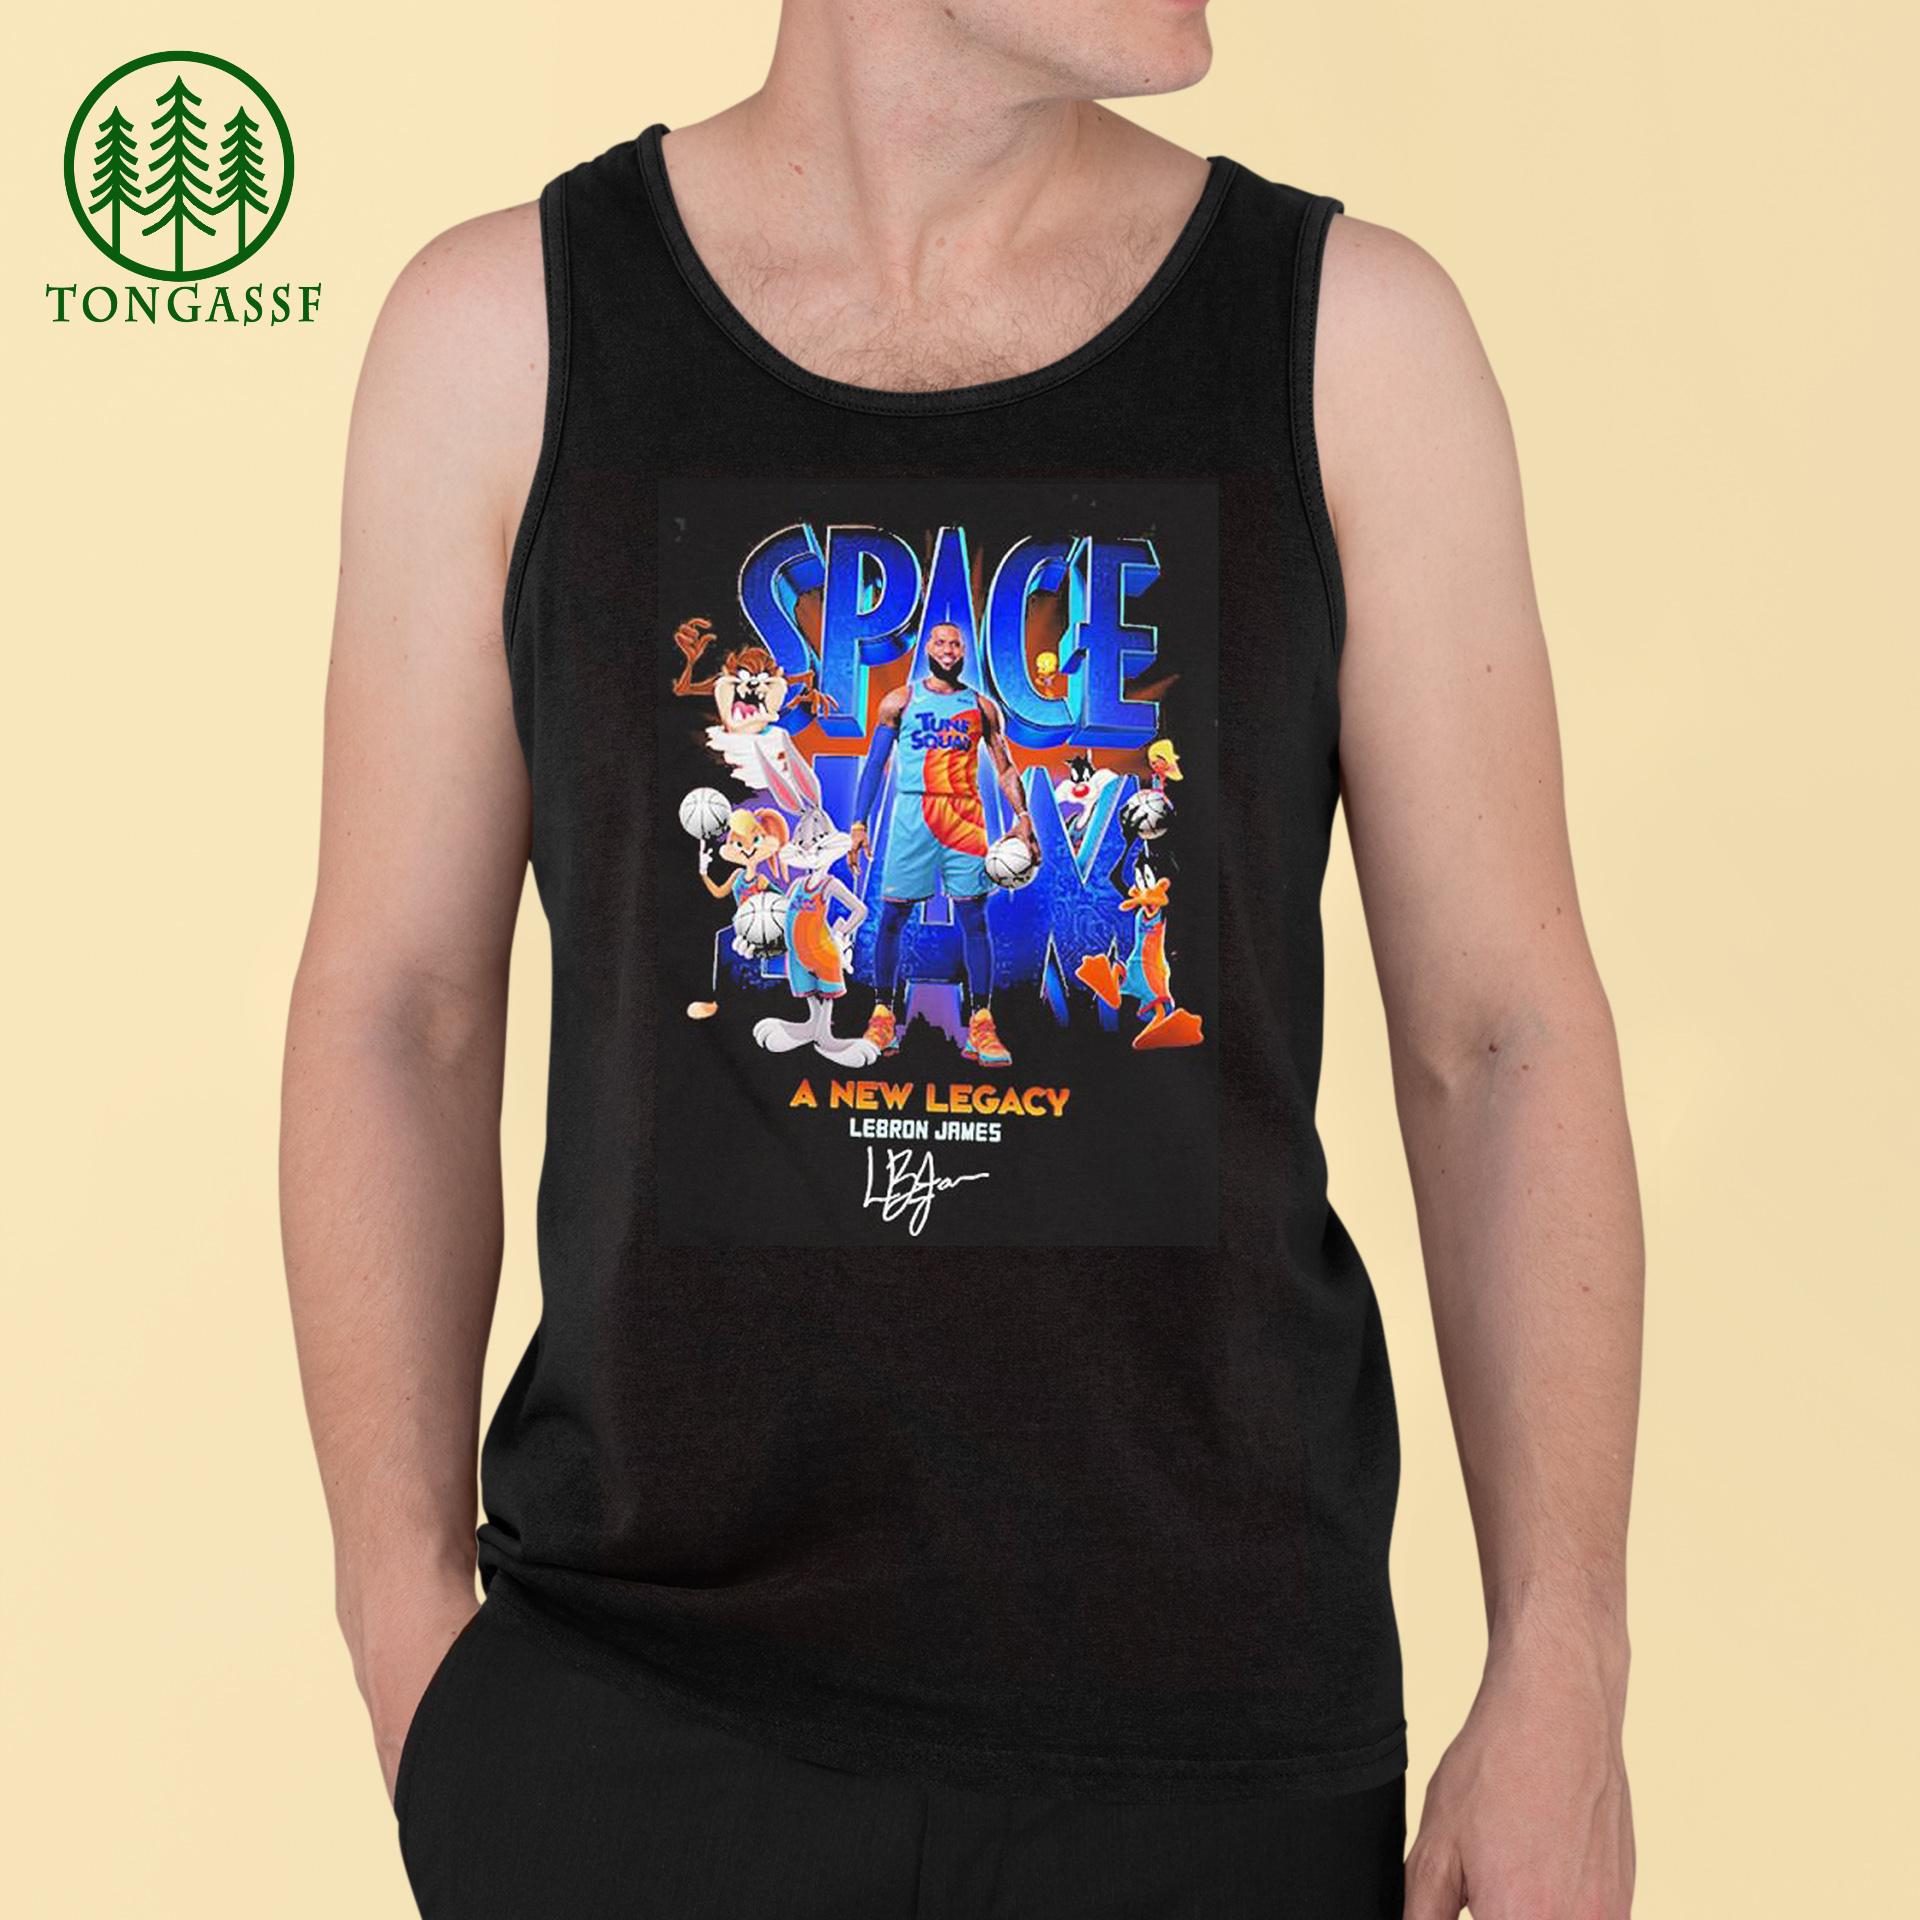 Space jam a new legacy lebron james signature Shirt